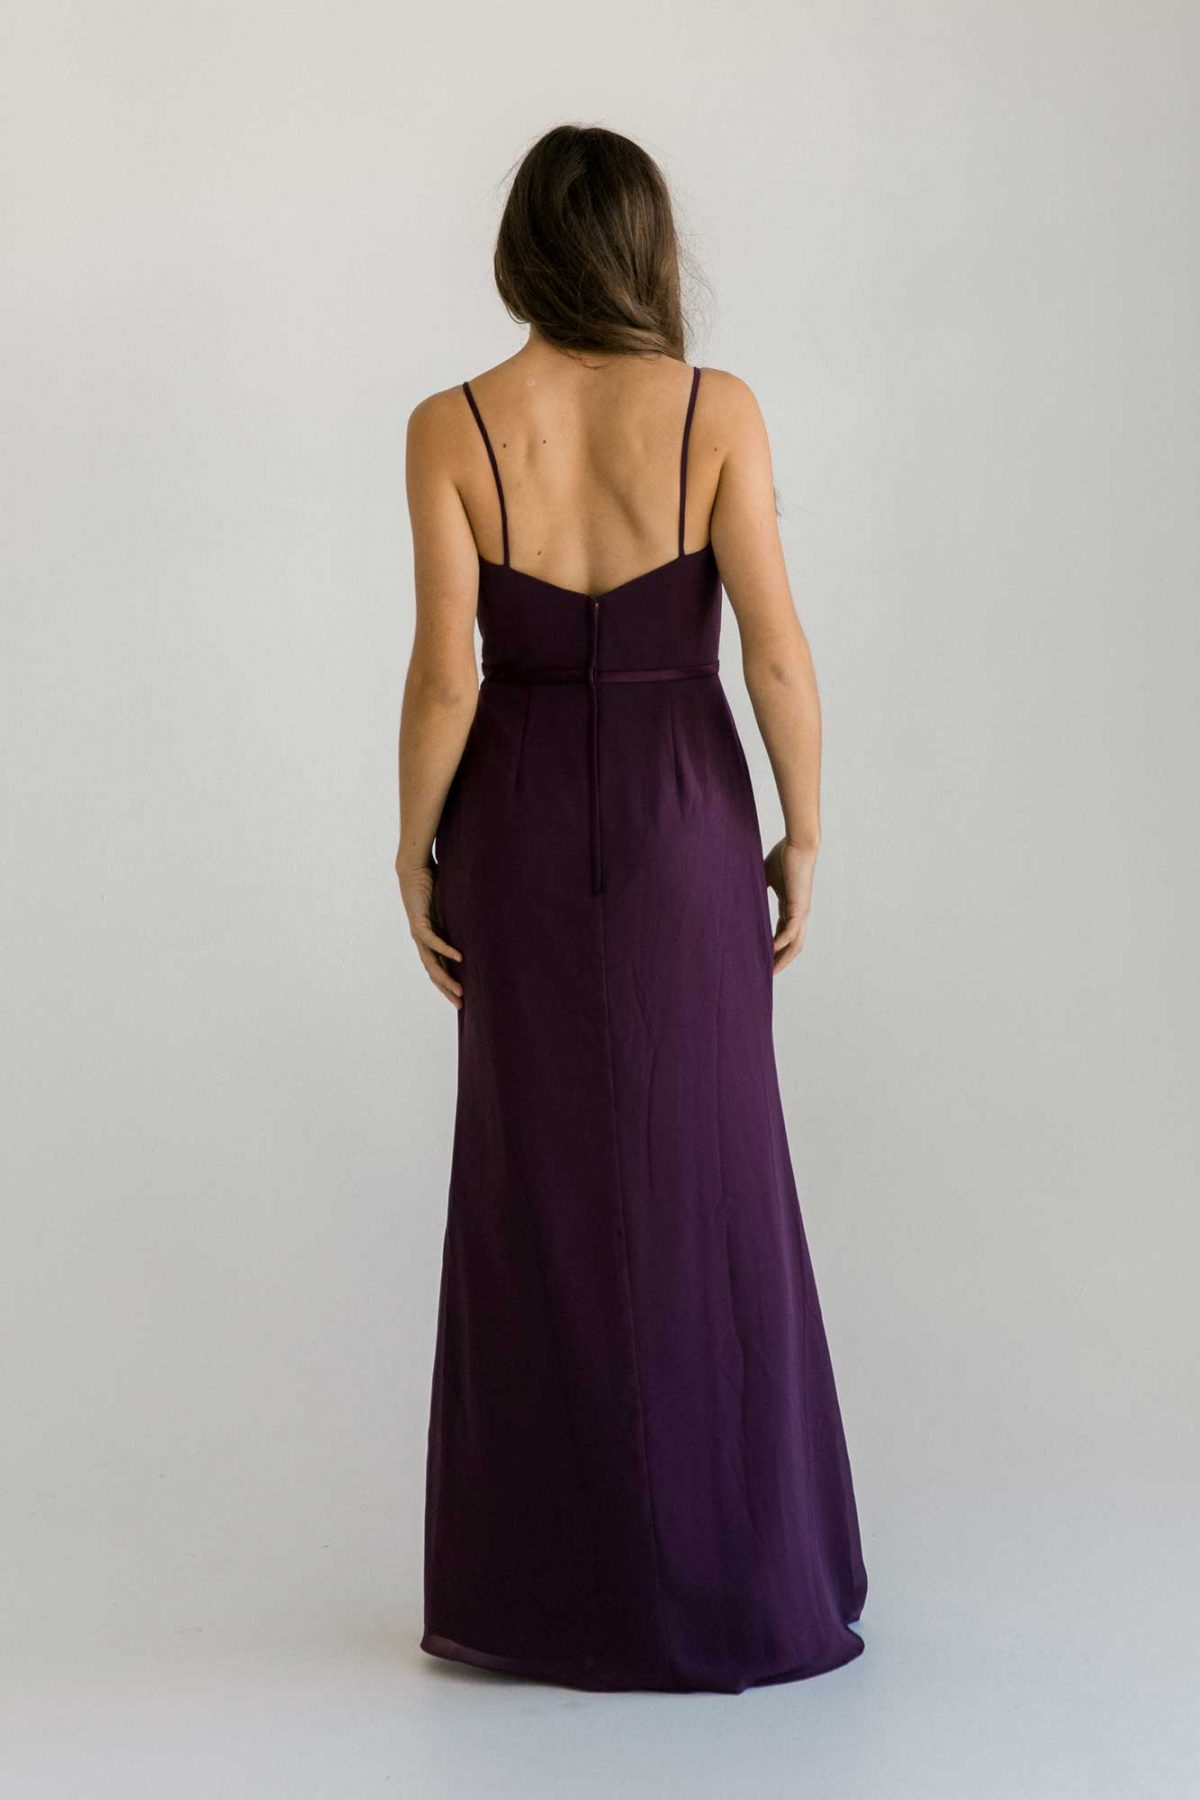 Luna dress in grape colour back view